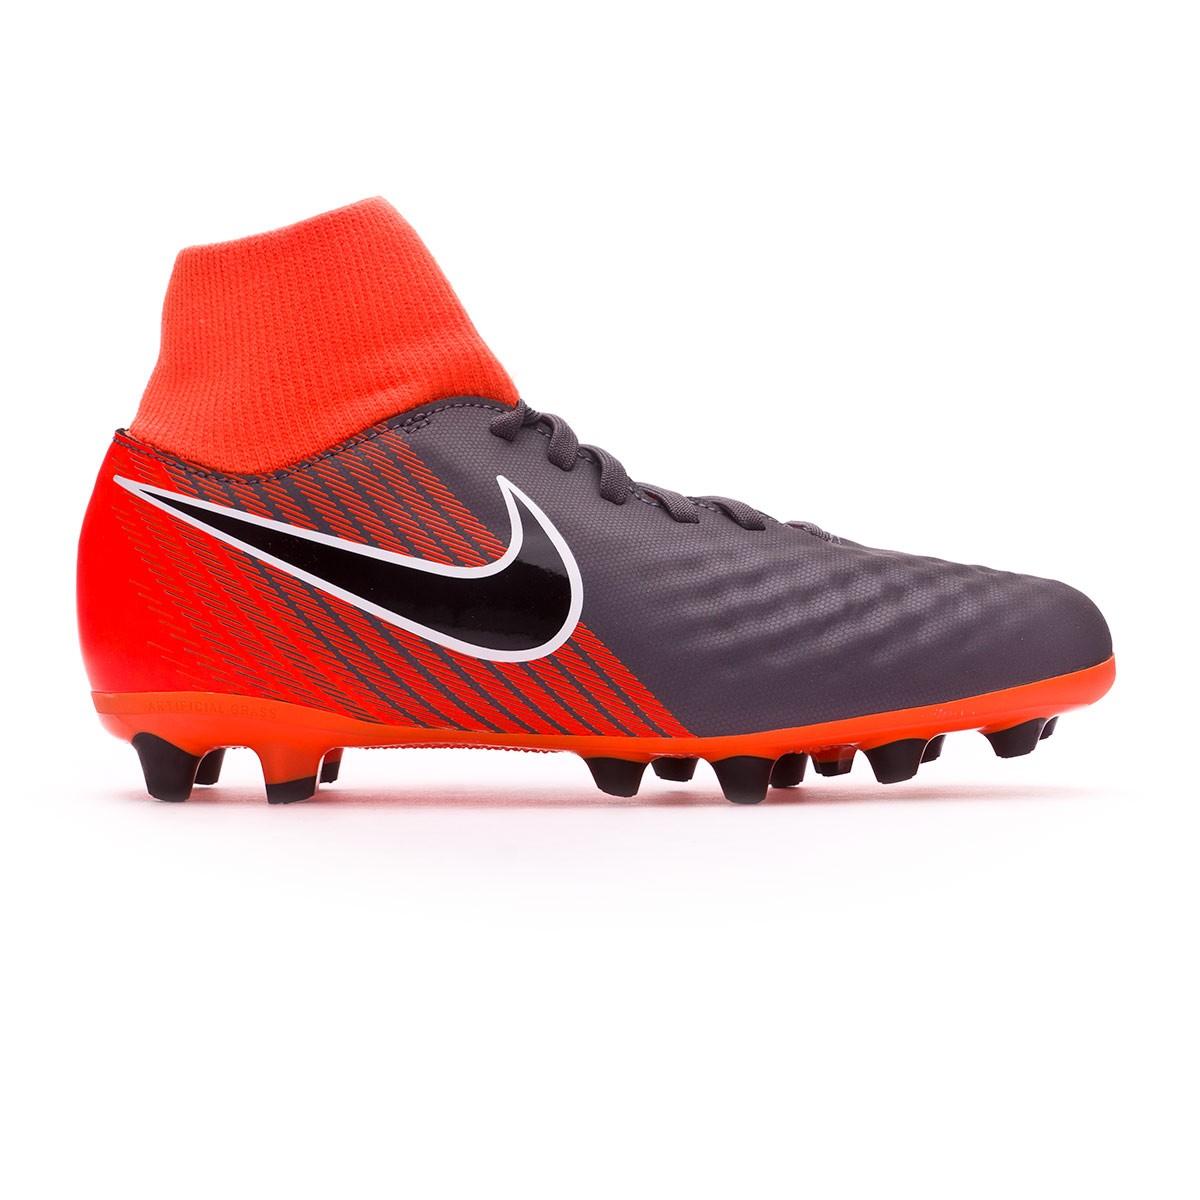 6835ac24aae Football Boots Nike Kids Magista Onda II DF AG-Pro Dark grey-Black-Total  orange-White - Tienda de fútbol Fútbol Emotion